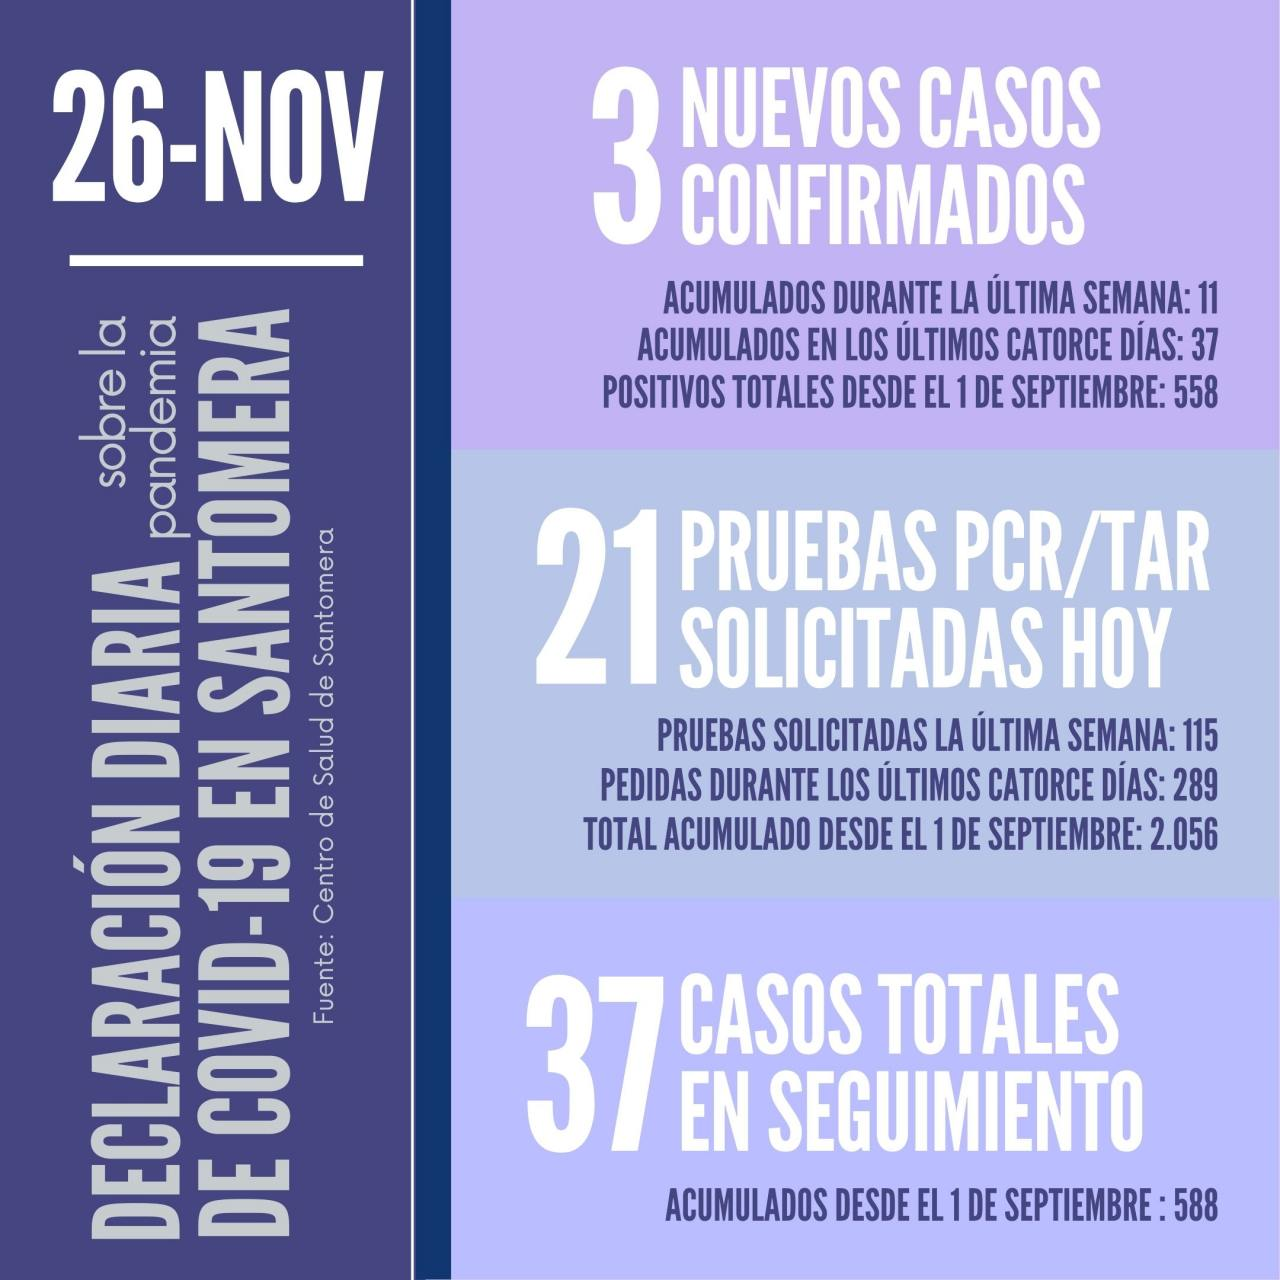 20201126_Datos-COVID-19-Santomera